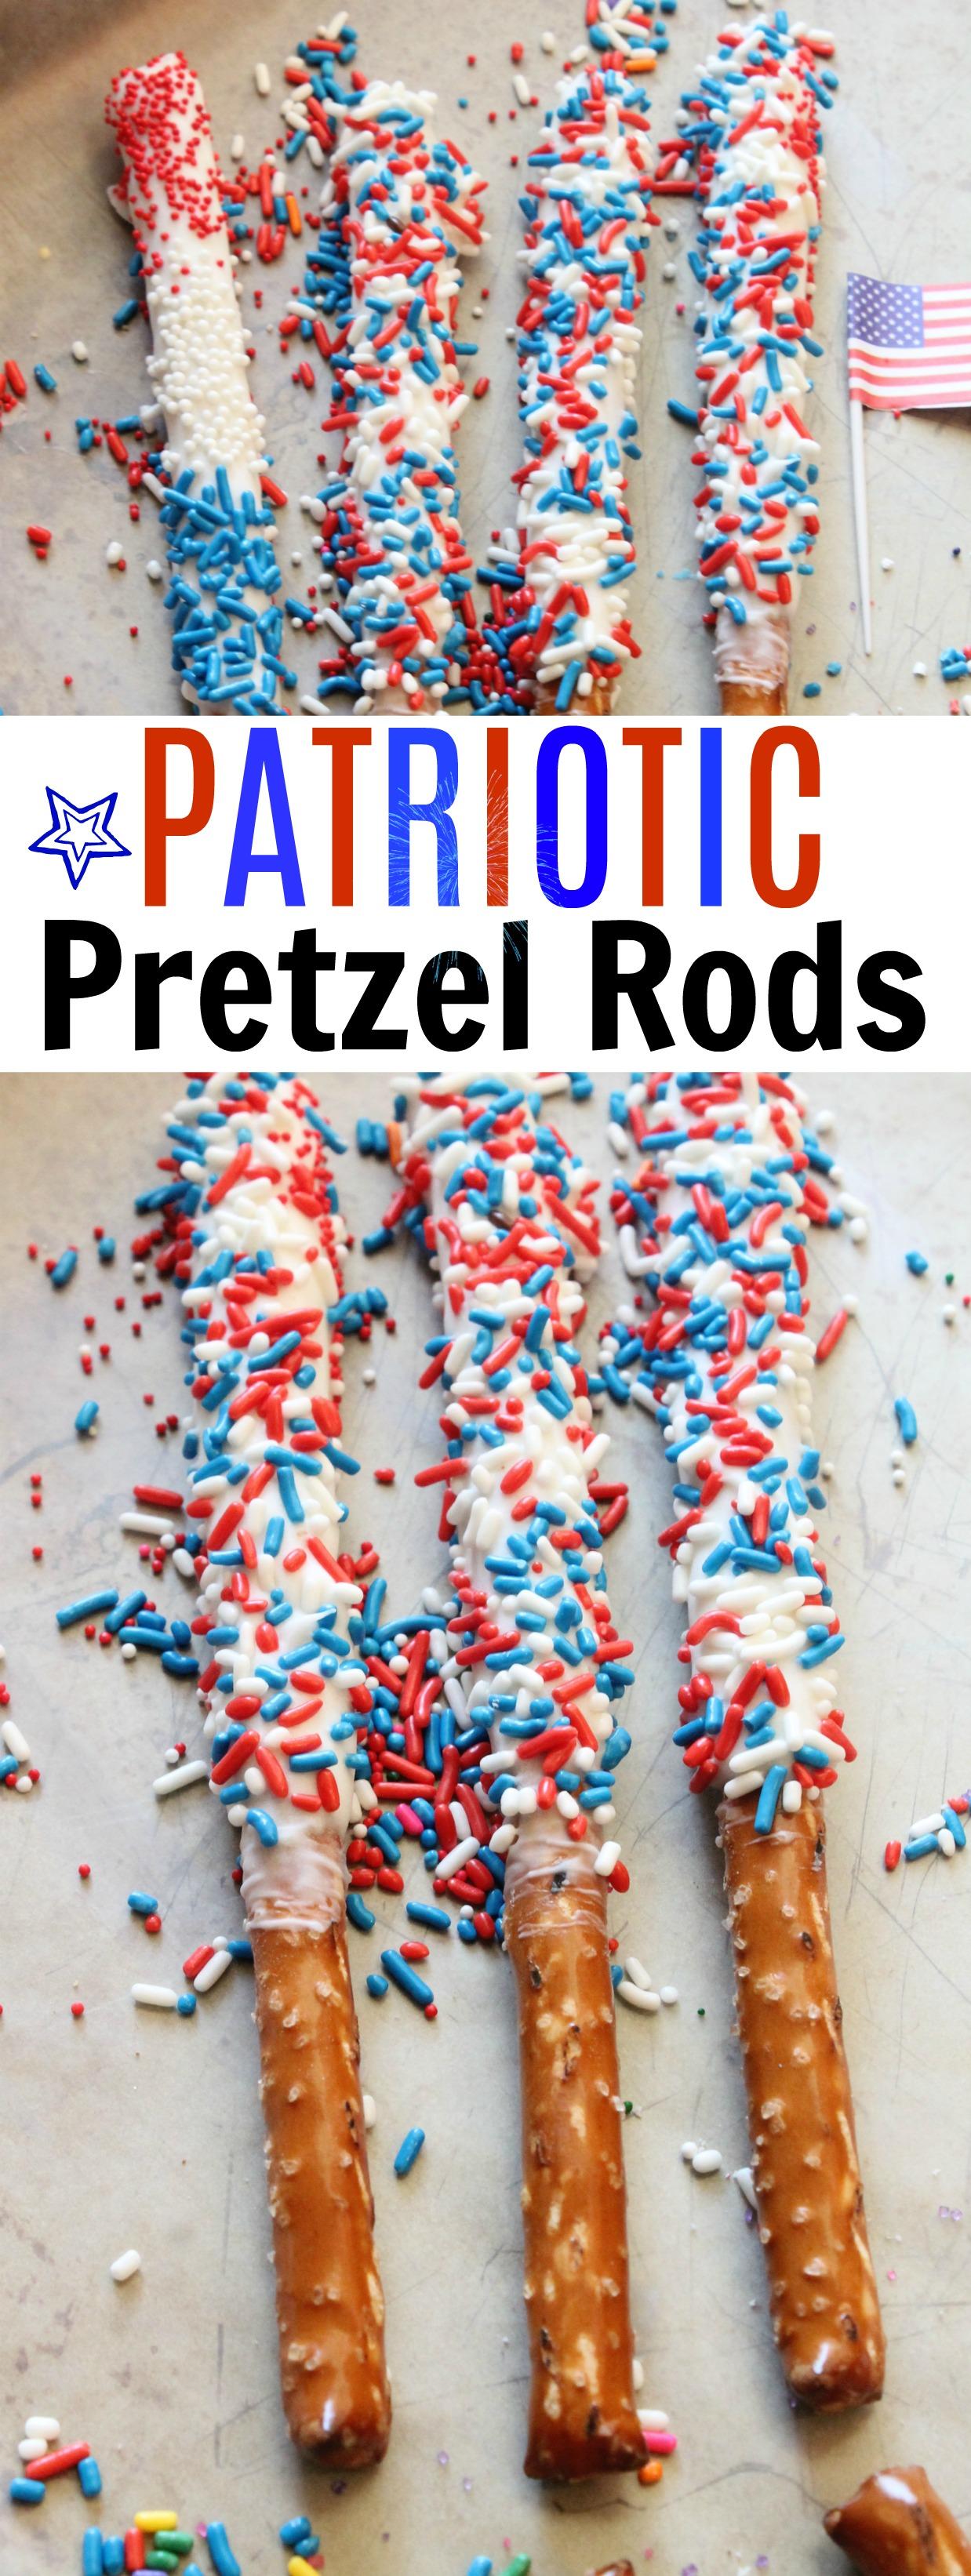 Easy 4h of July Desserts Idea-Patriotic Pretzel Rods Recipe-Easy Fourth of July Desserts